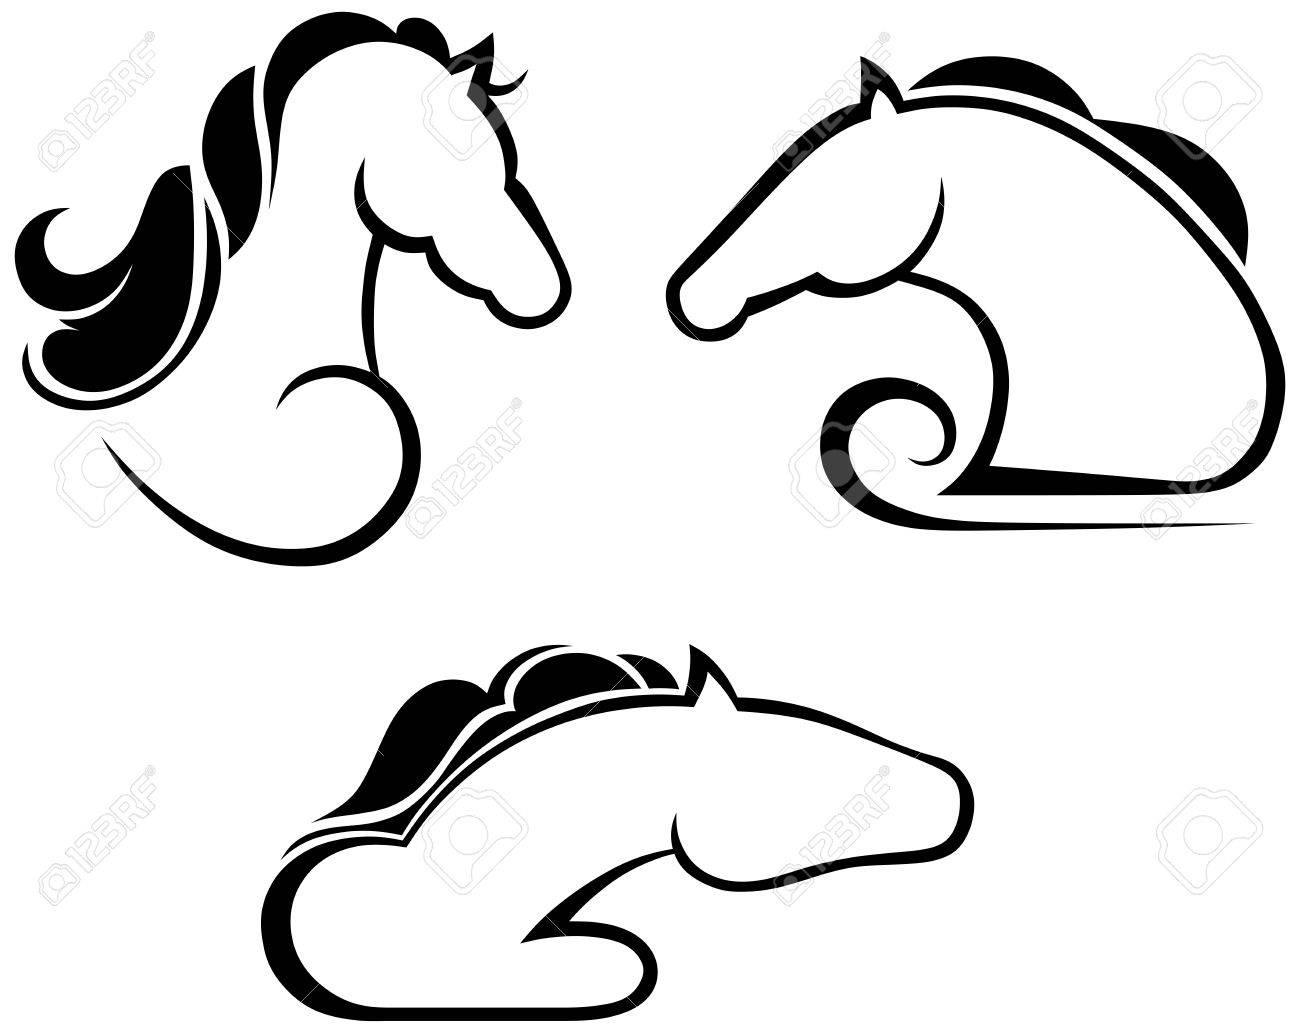 Silhouette black horse Stock Vector - 15802547